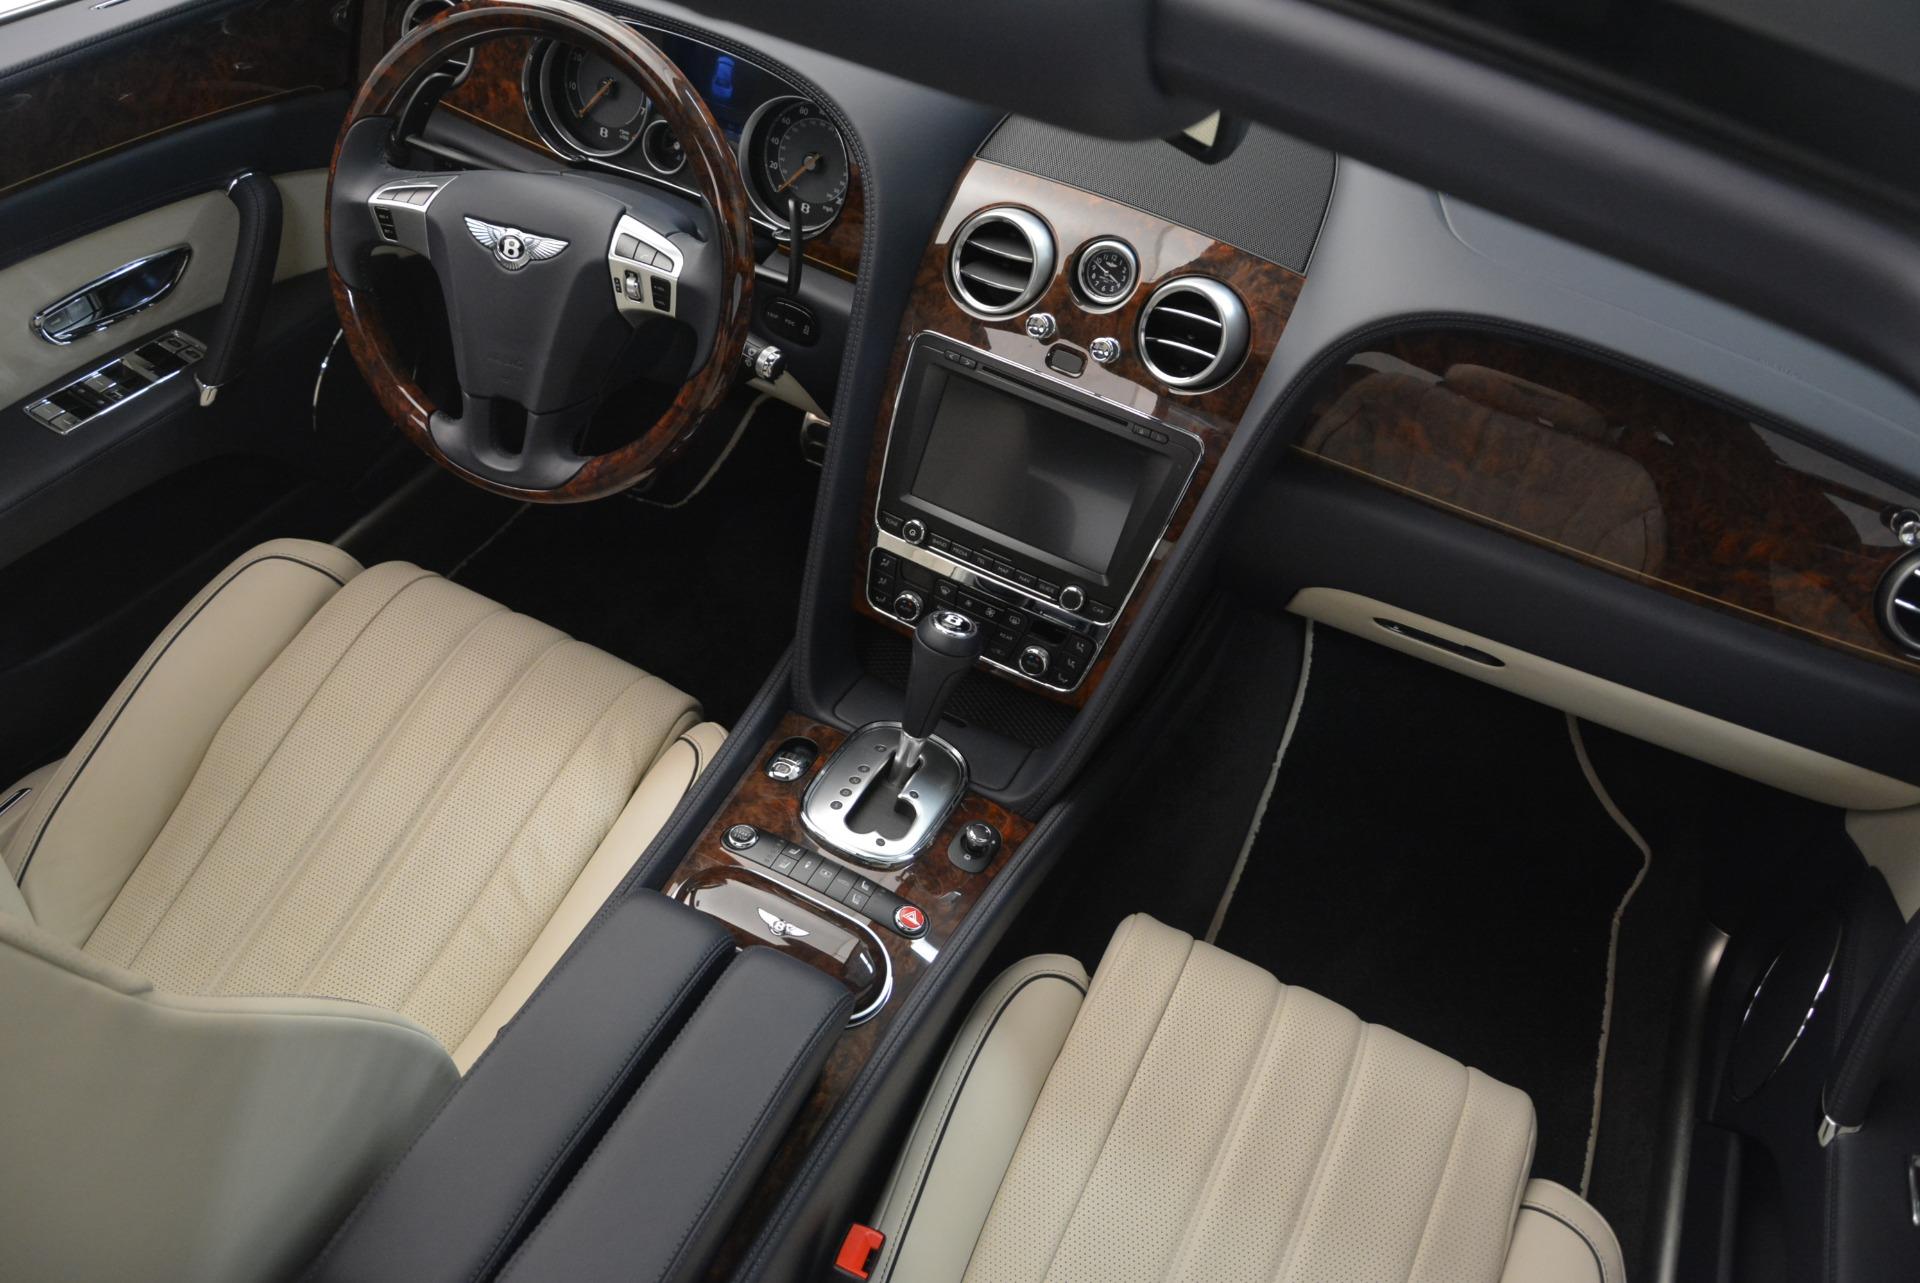 Used 2015 Bentley Flying Spur W12 For Sale In Westport, CT 2339_p31